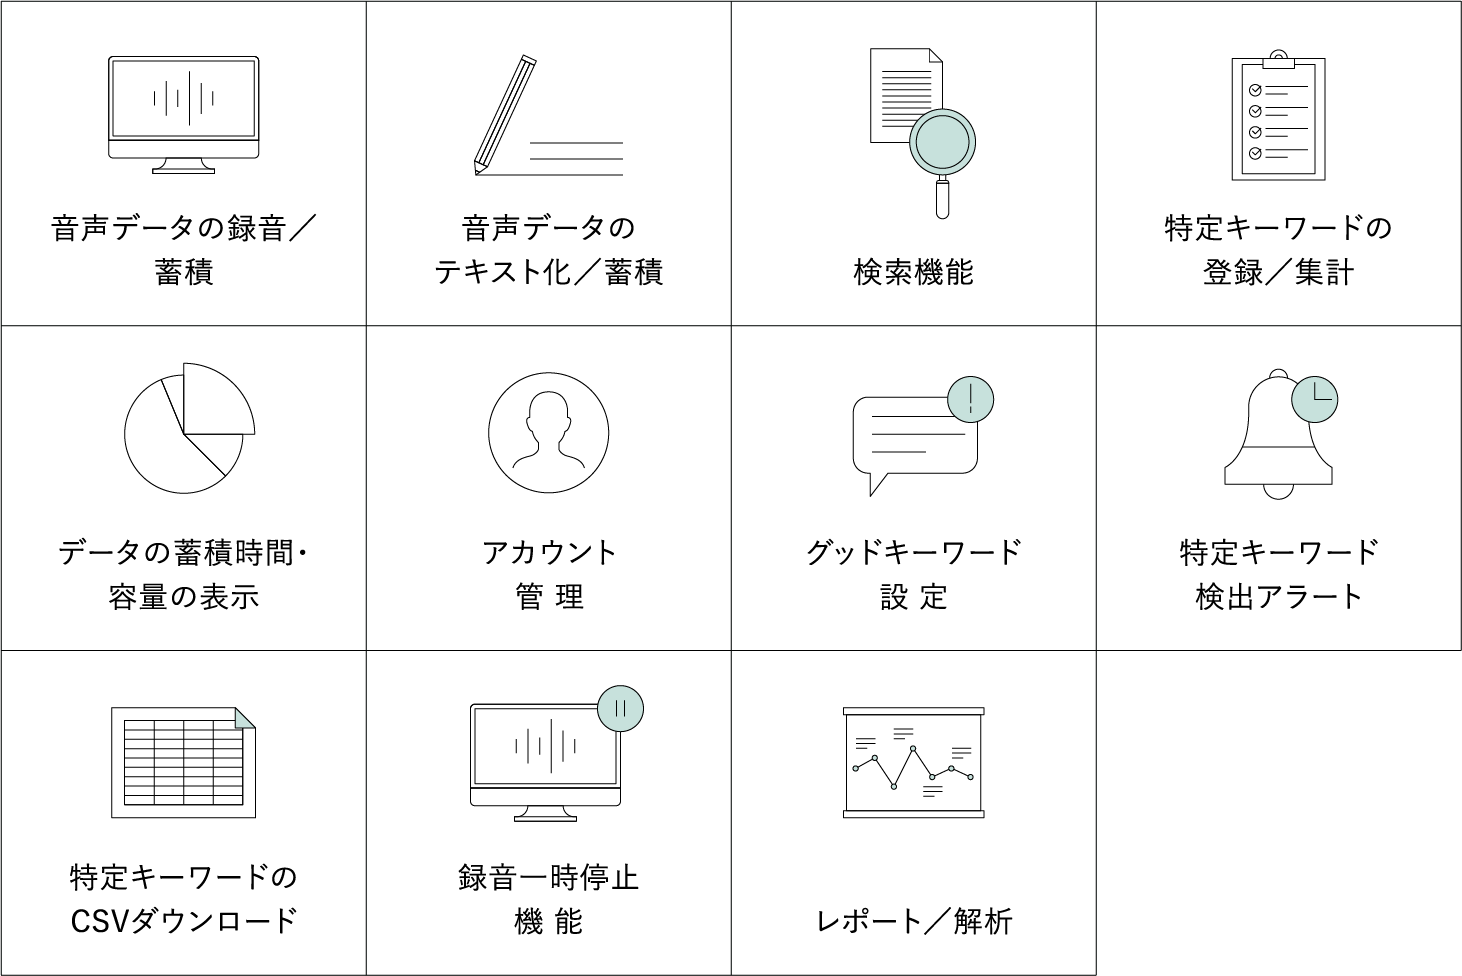 POINT 1 RECORiSの特徴・詳細